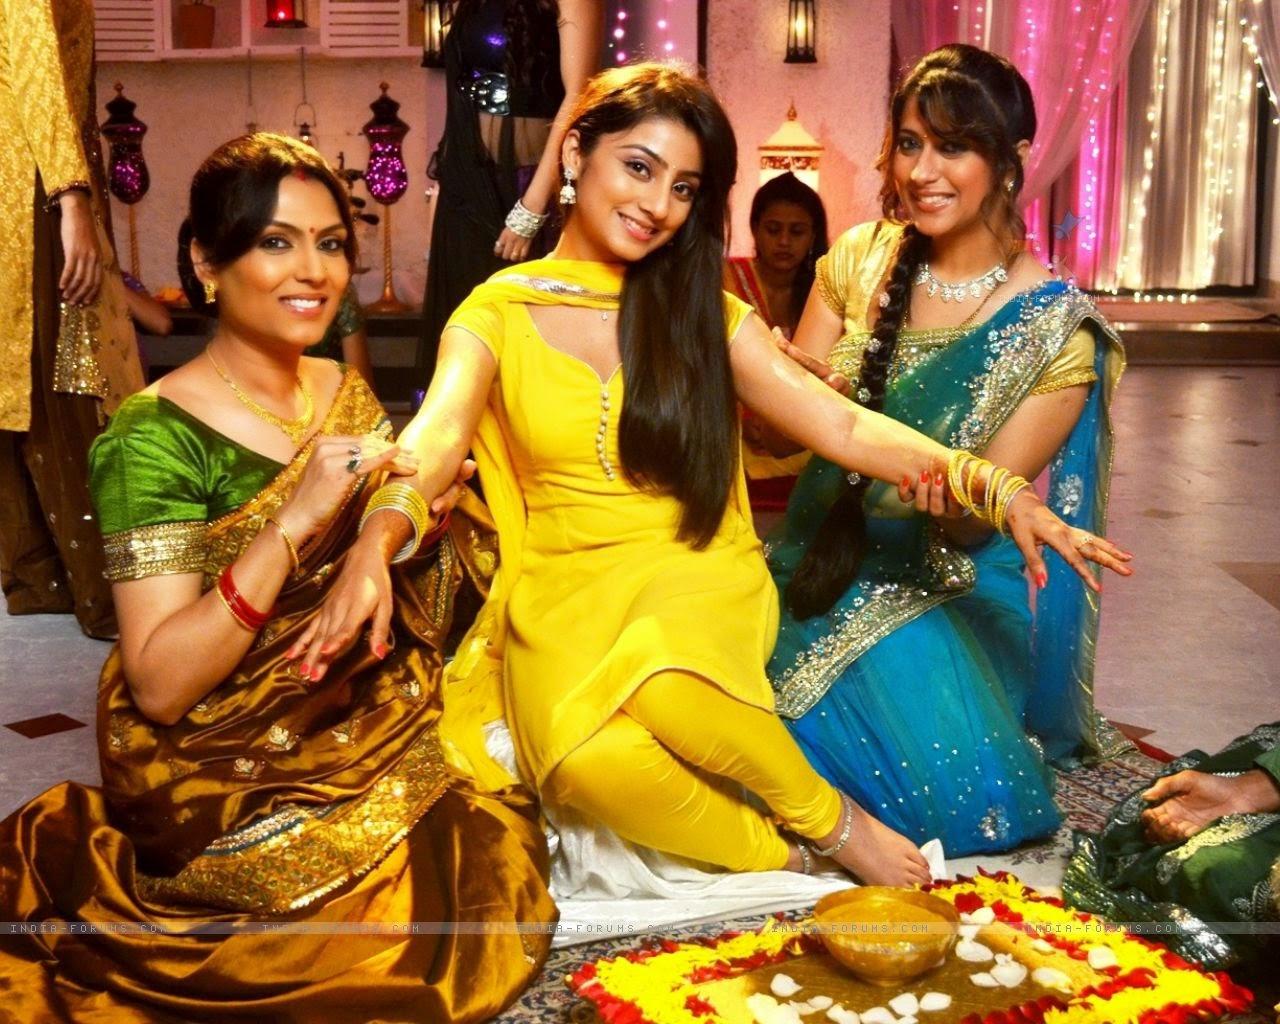 Doli Armaano Ki (TV Serial) - TRP, Reviews, Cast & Story